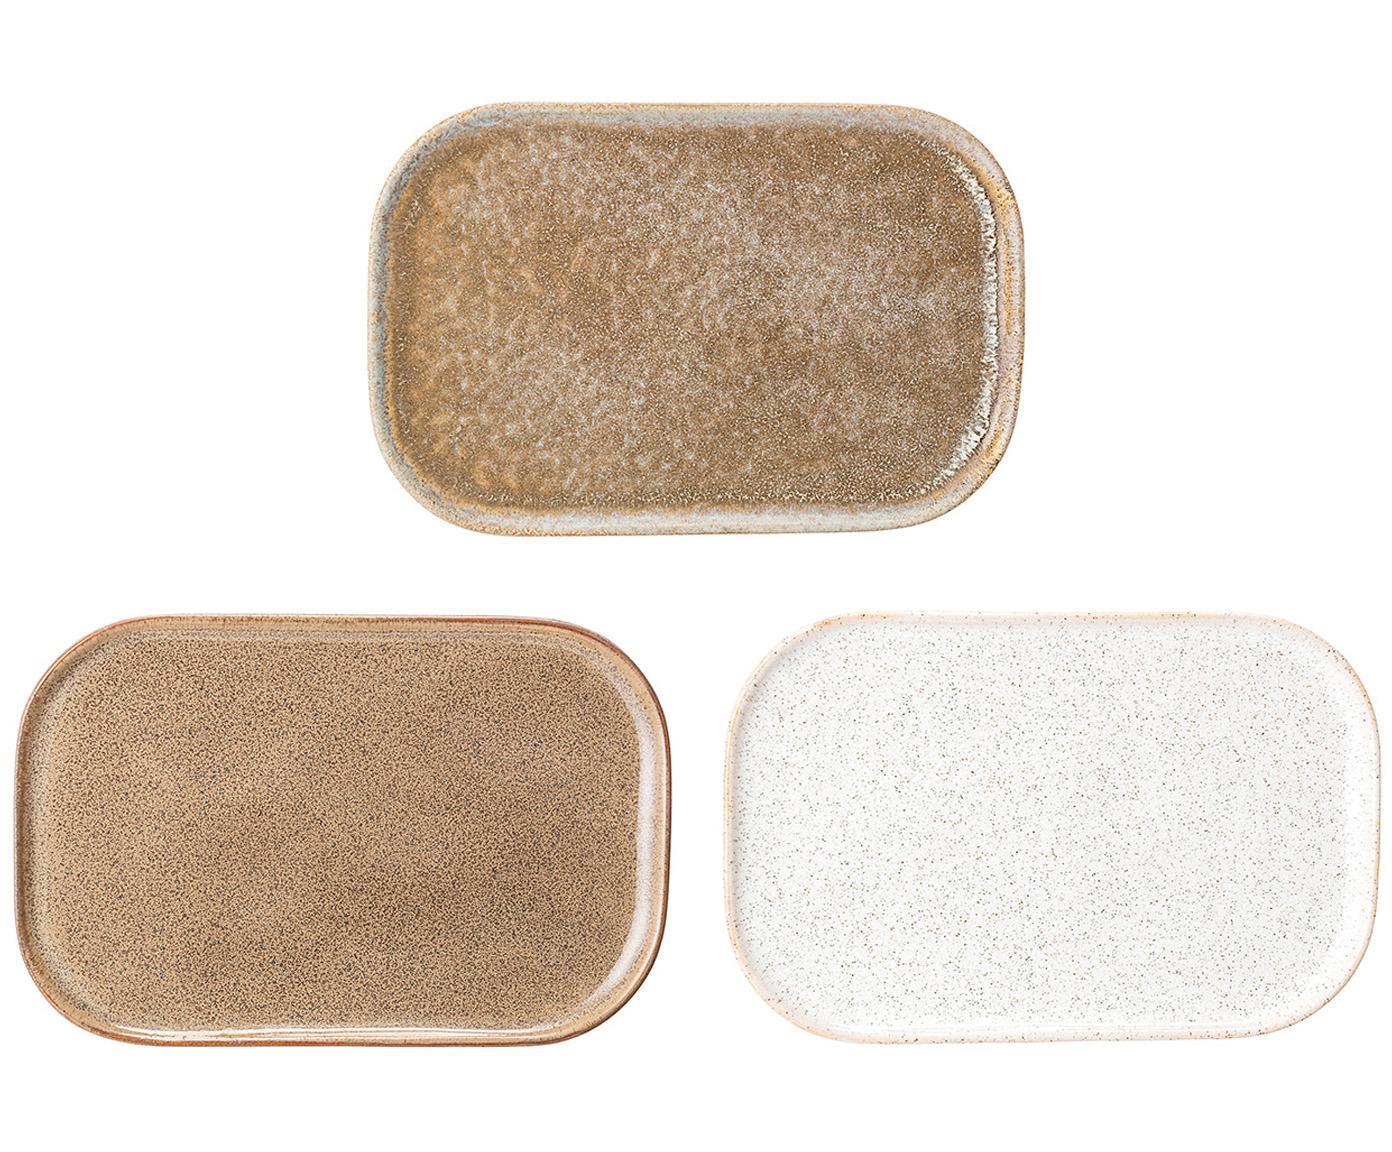 Handgemaakte serveerplateauset Addison, 3-delig, Keramiek, Beige, wit, B 15 x D 23 cm